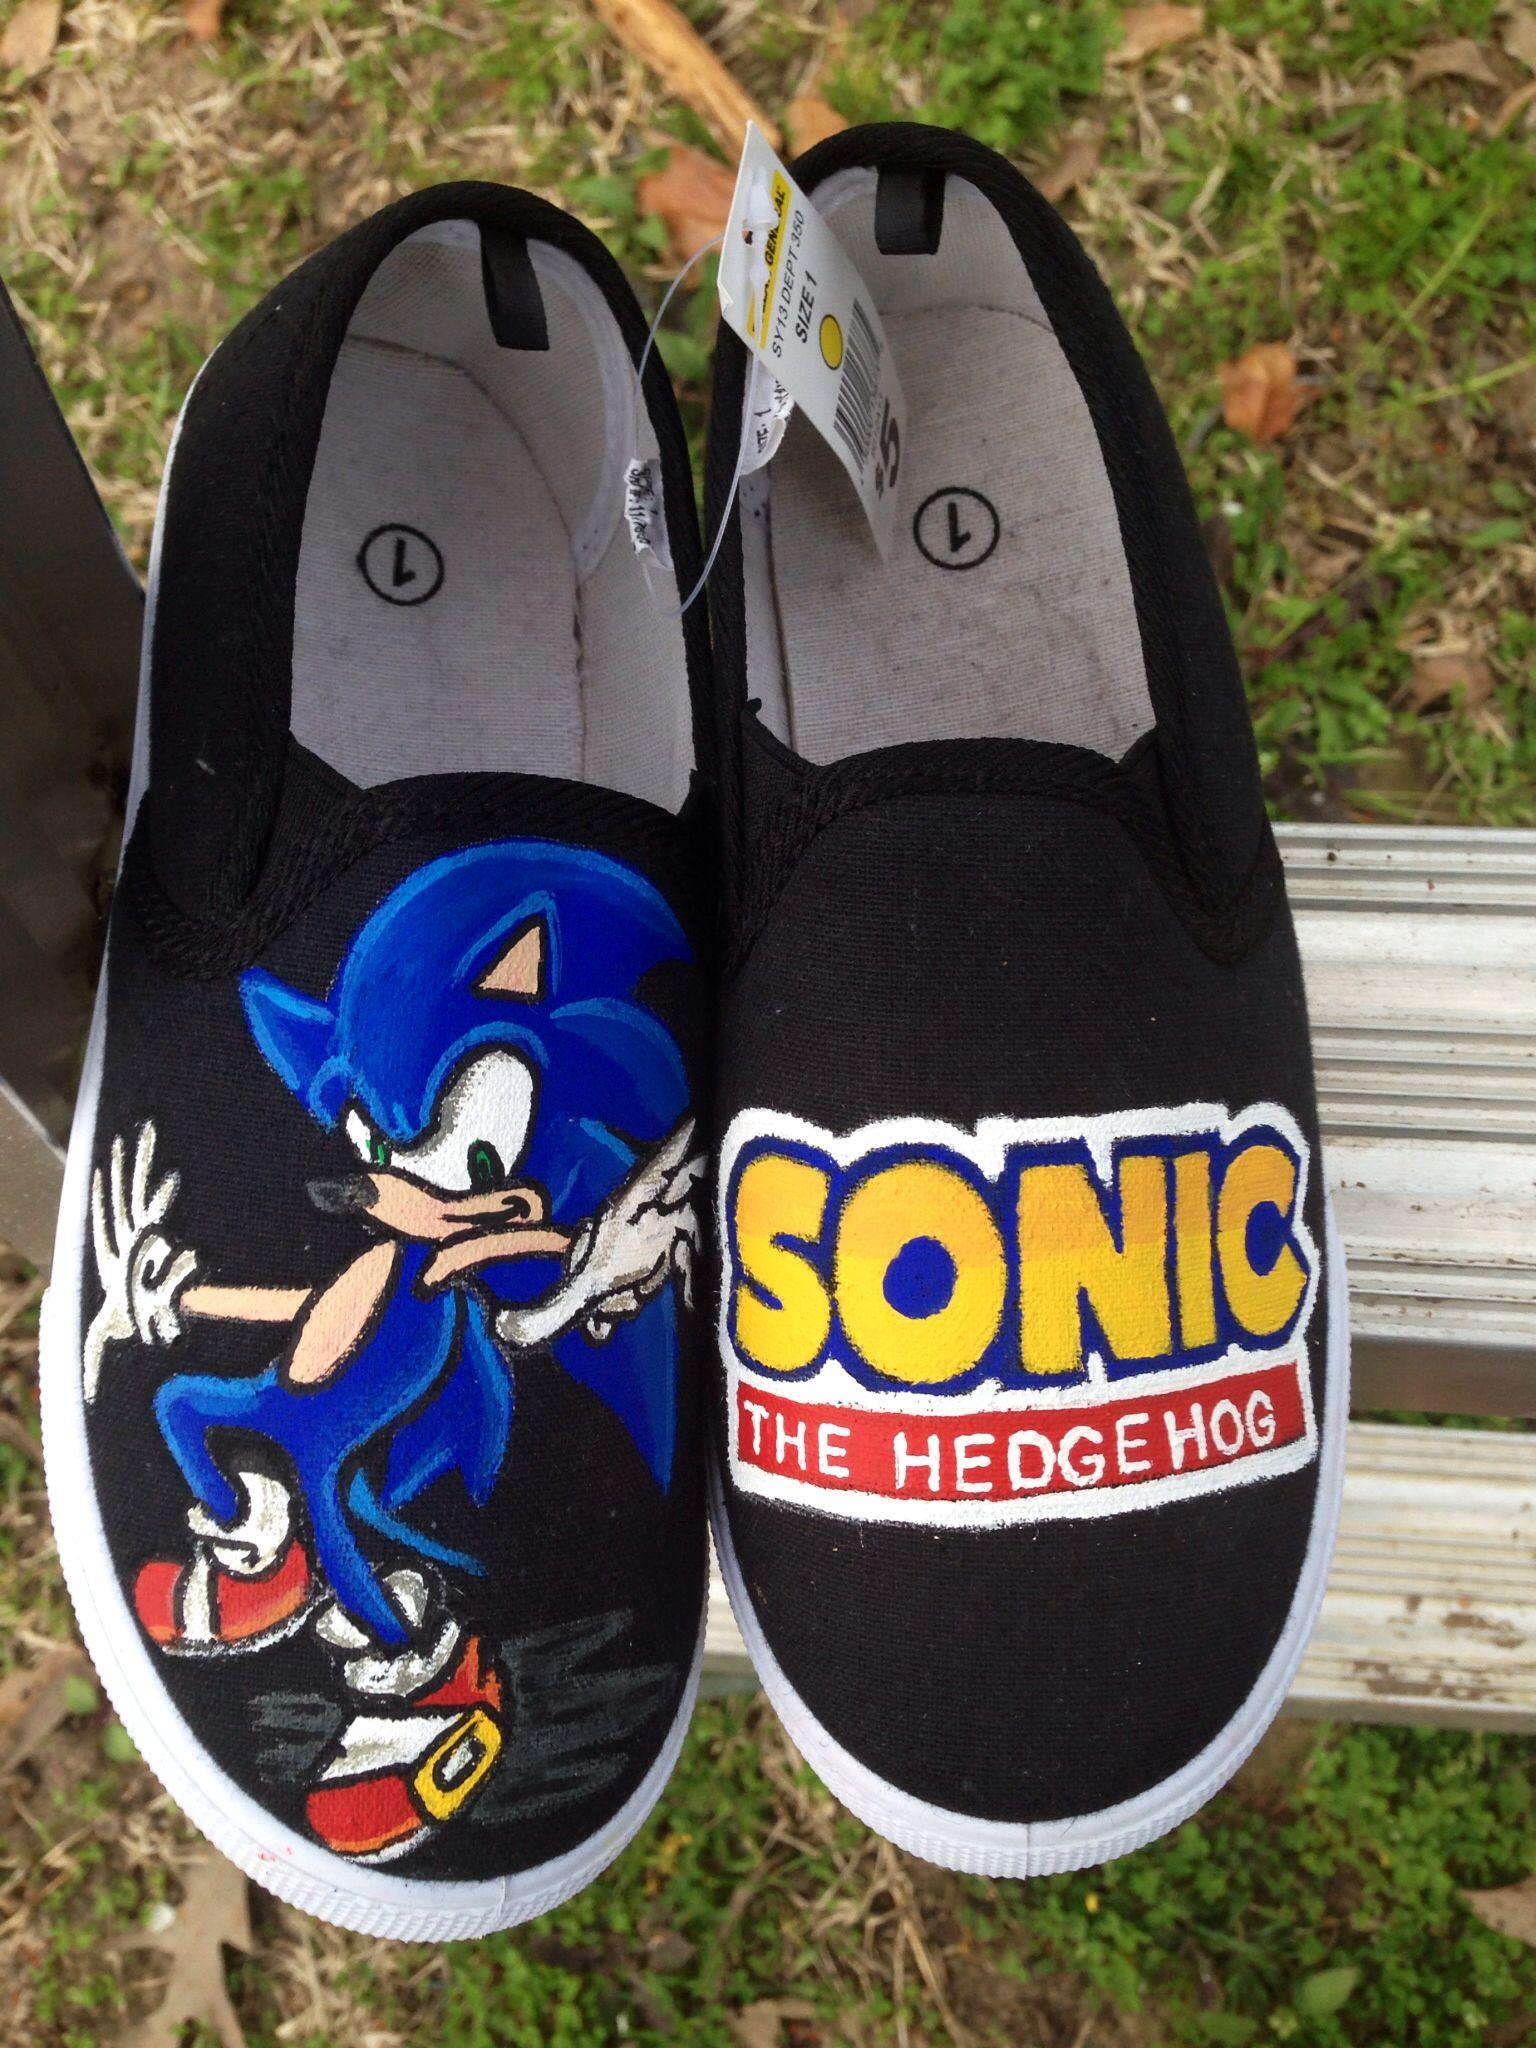 a94f080f29db Sonic the Hedgehog shoes www.offbeatcanvas.com